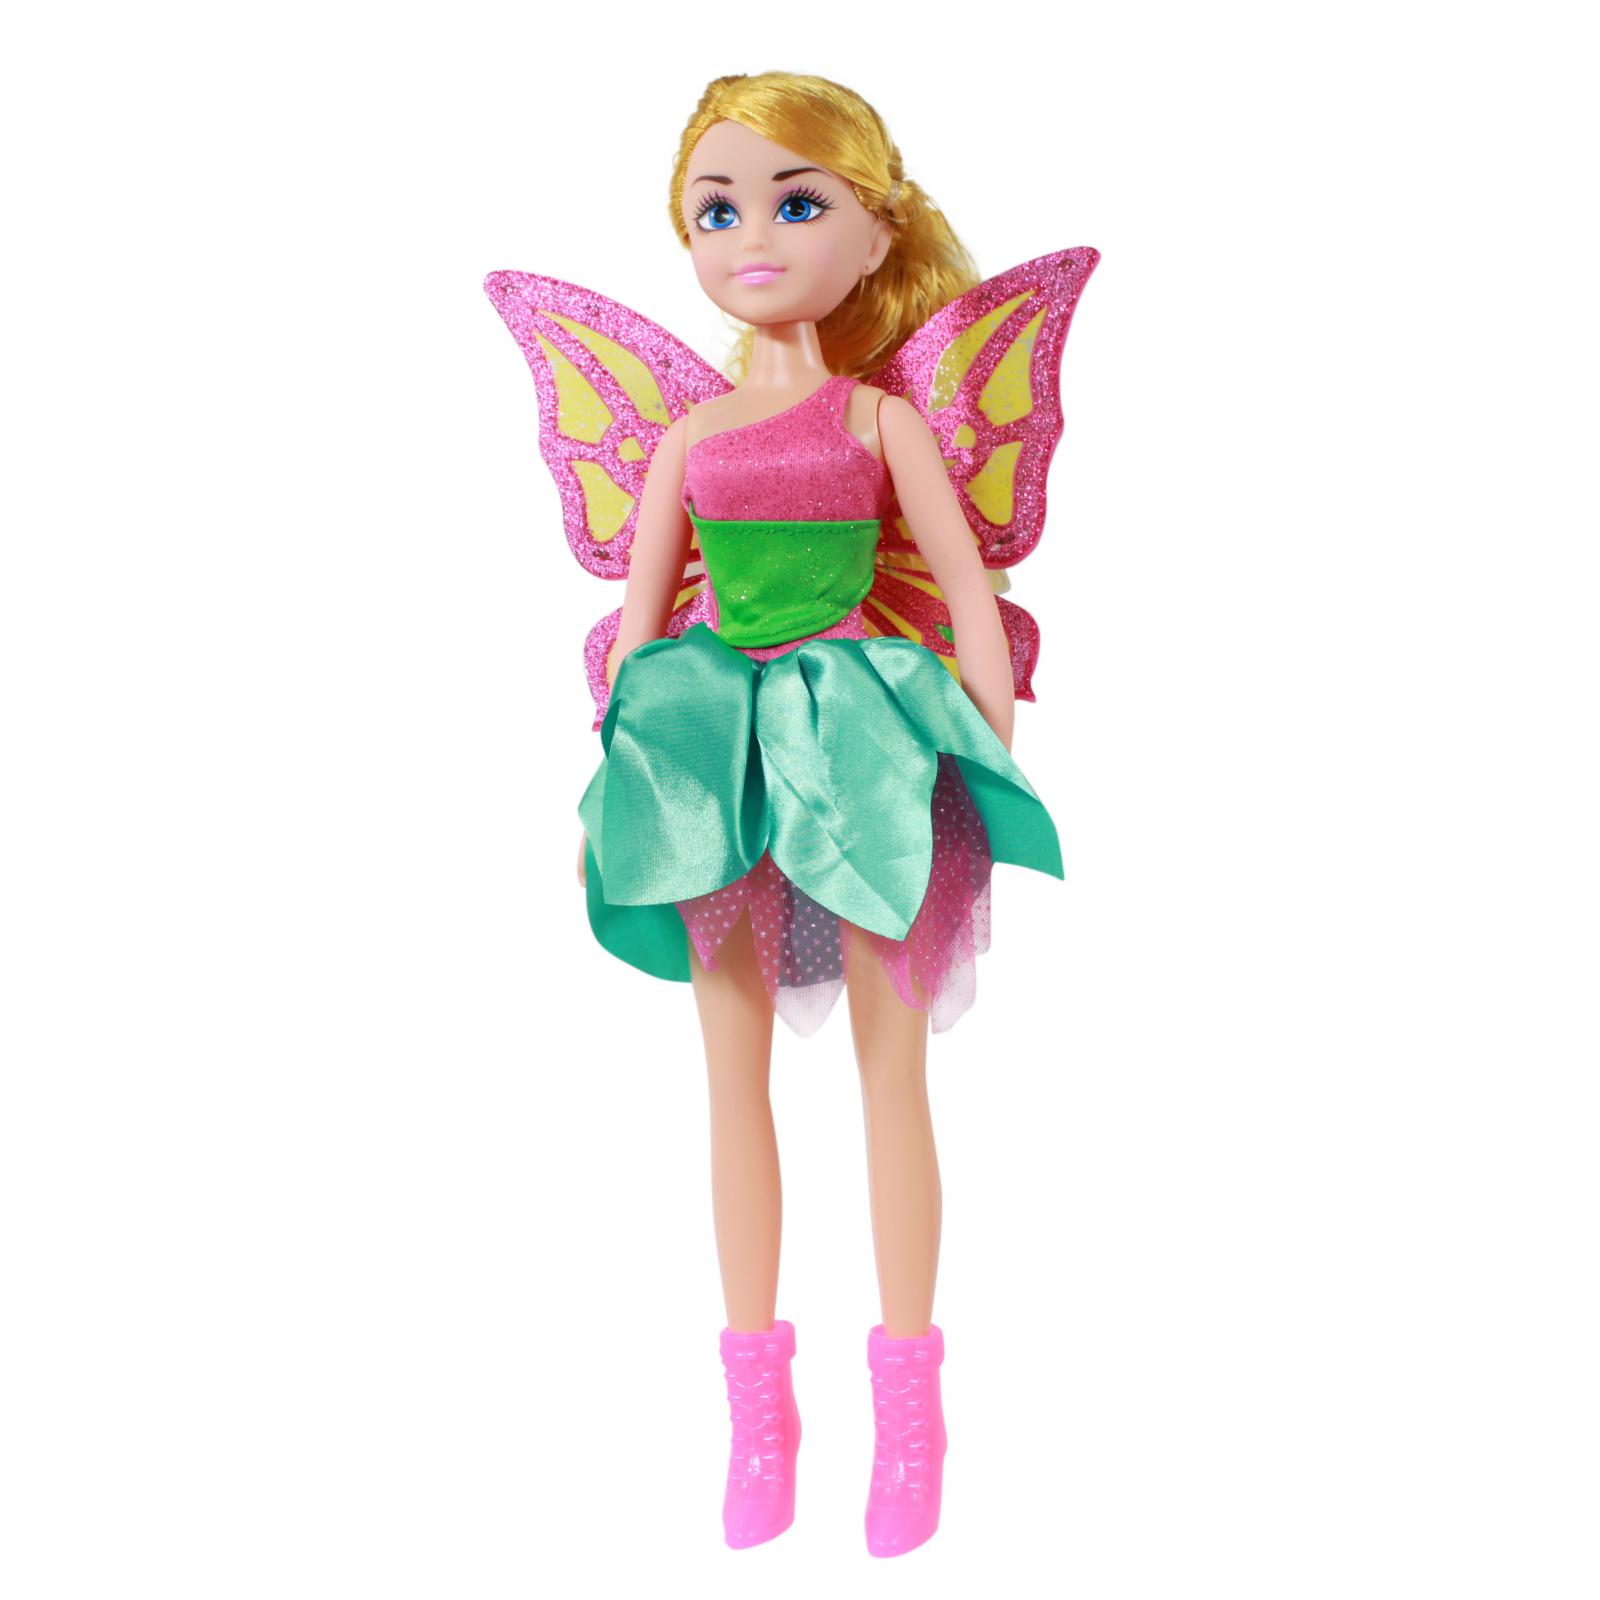 TychoTyke Girls Fairy Princess Doll Green Dress 17 Inch